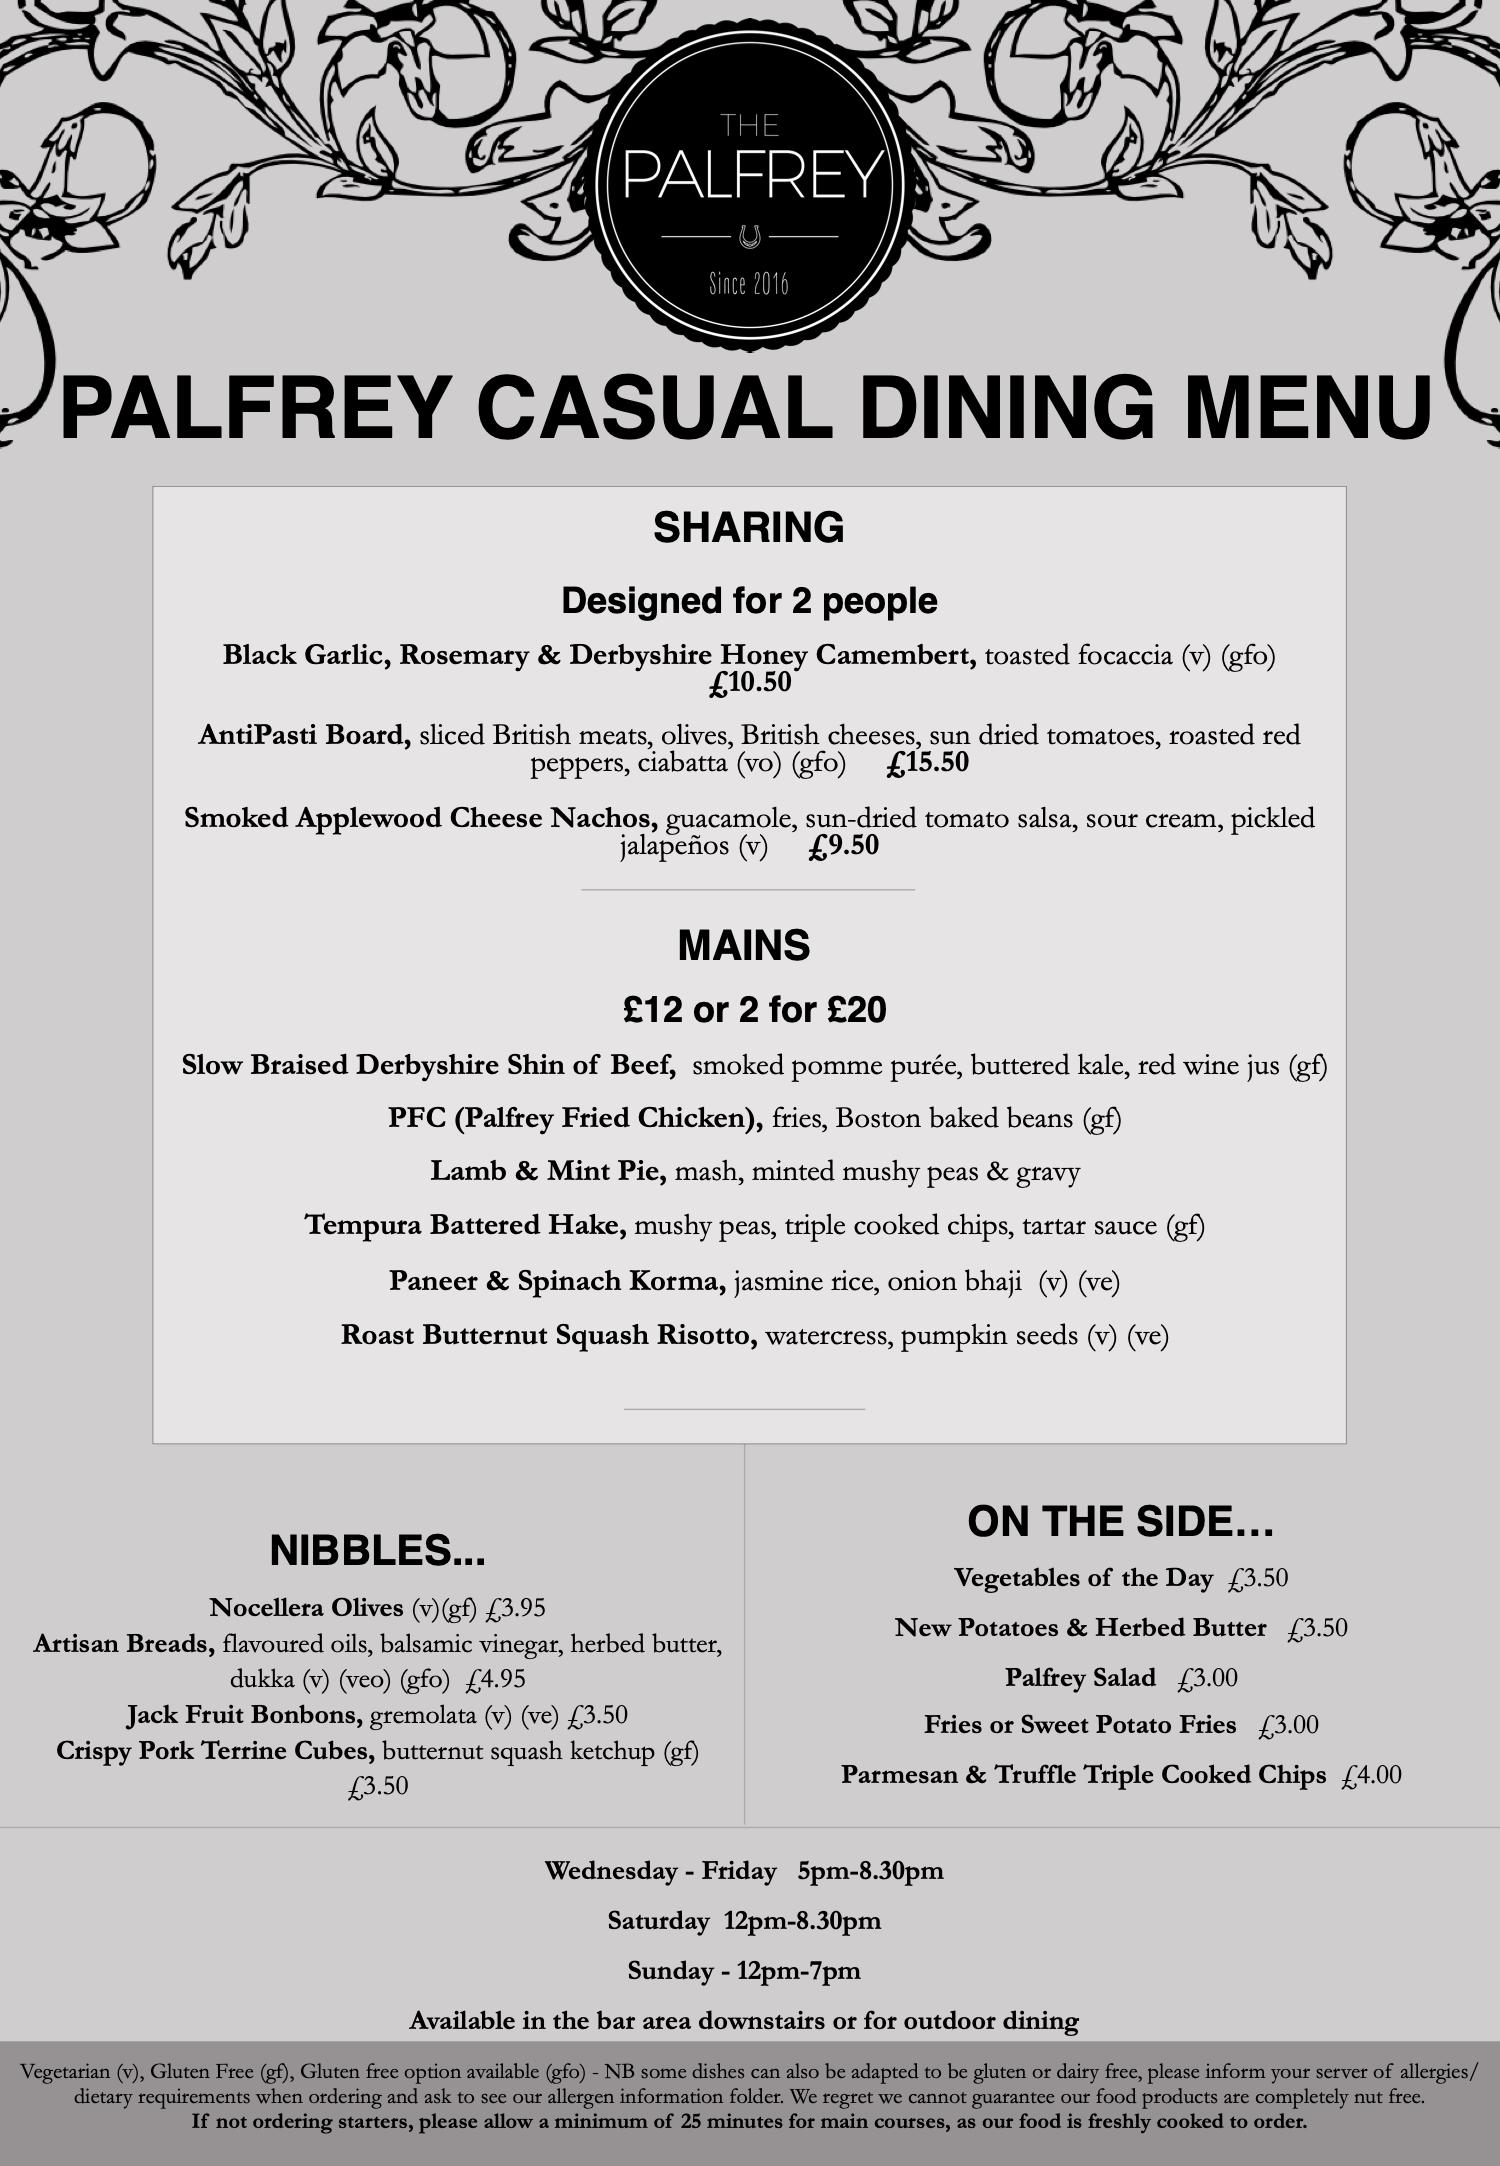 Palfrey Casual Dining Menu - October November 2020